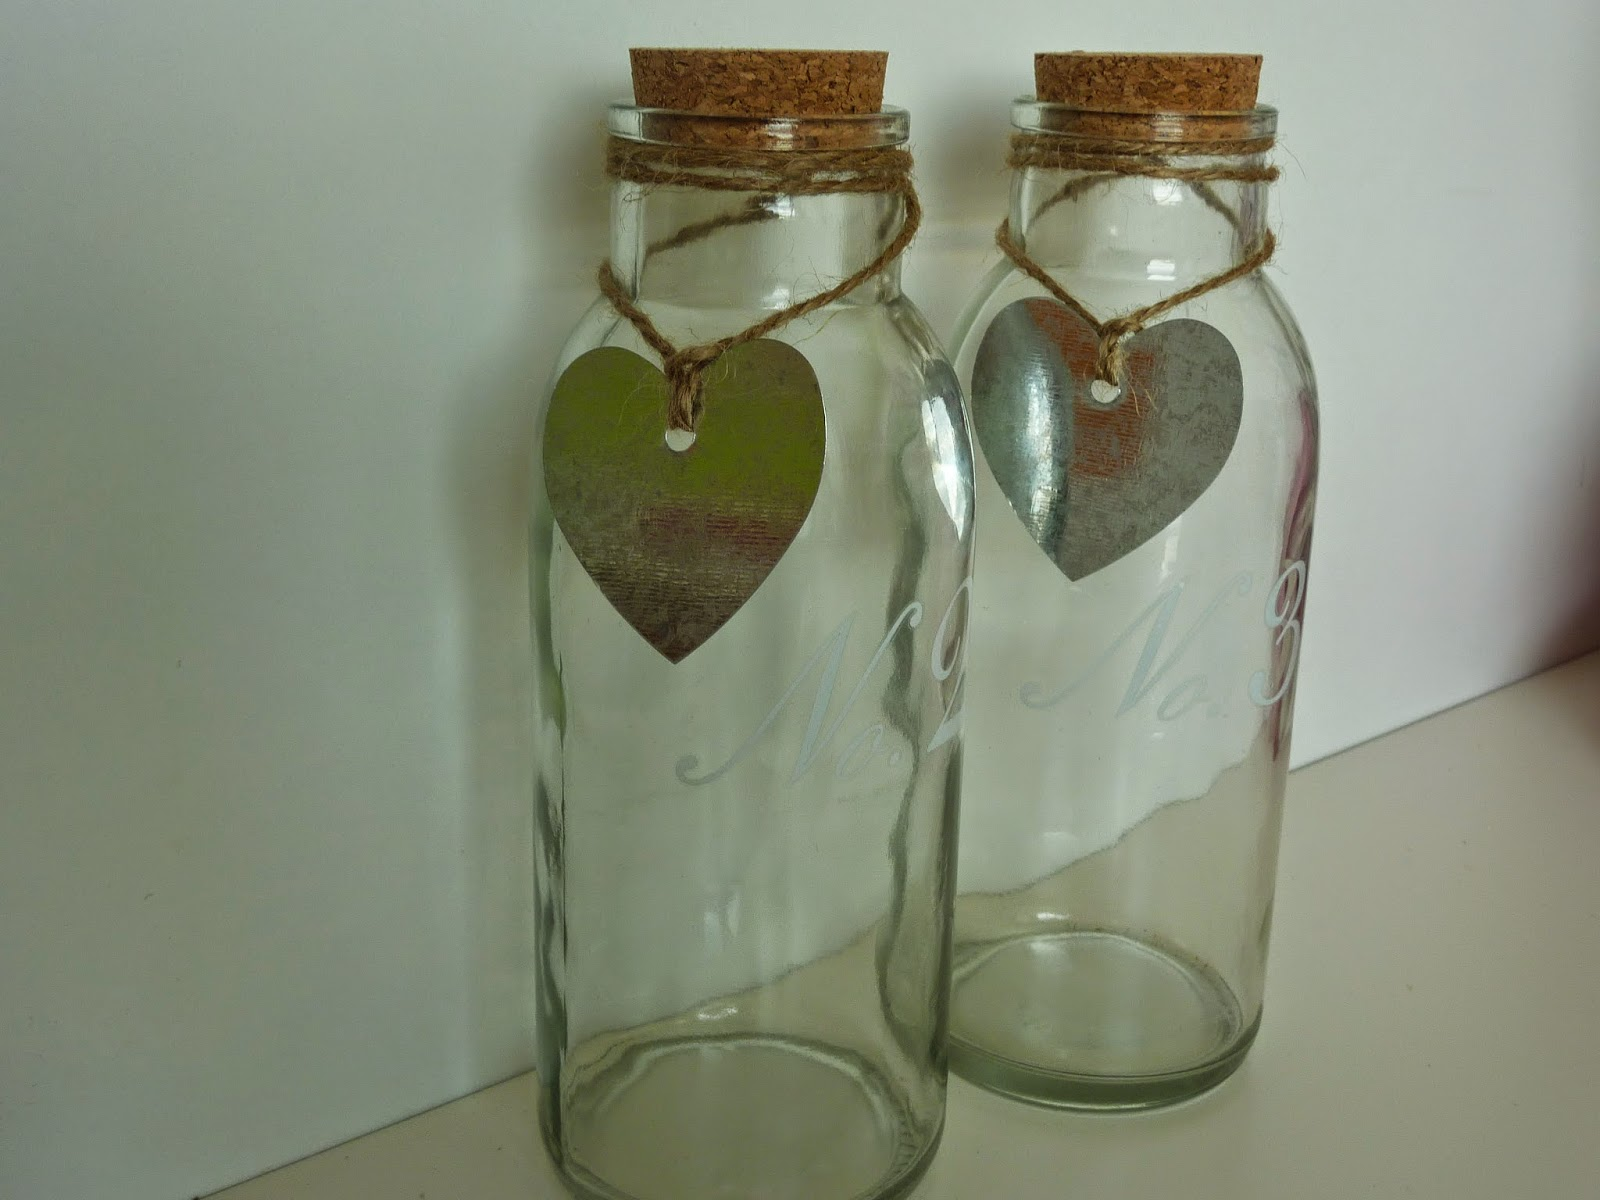 lege glazen flesjes kopen action